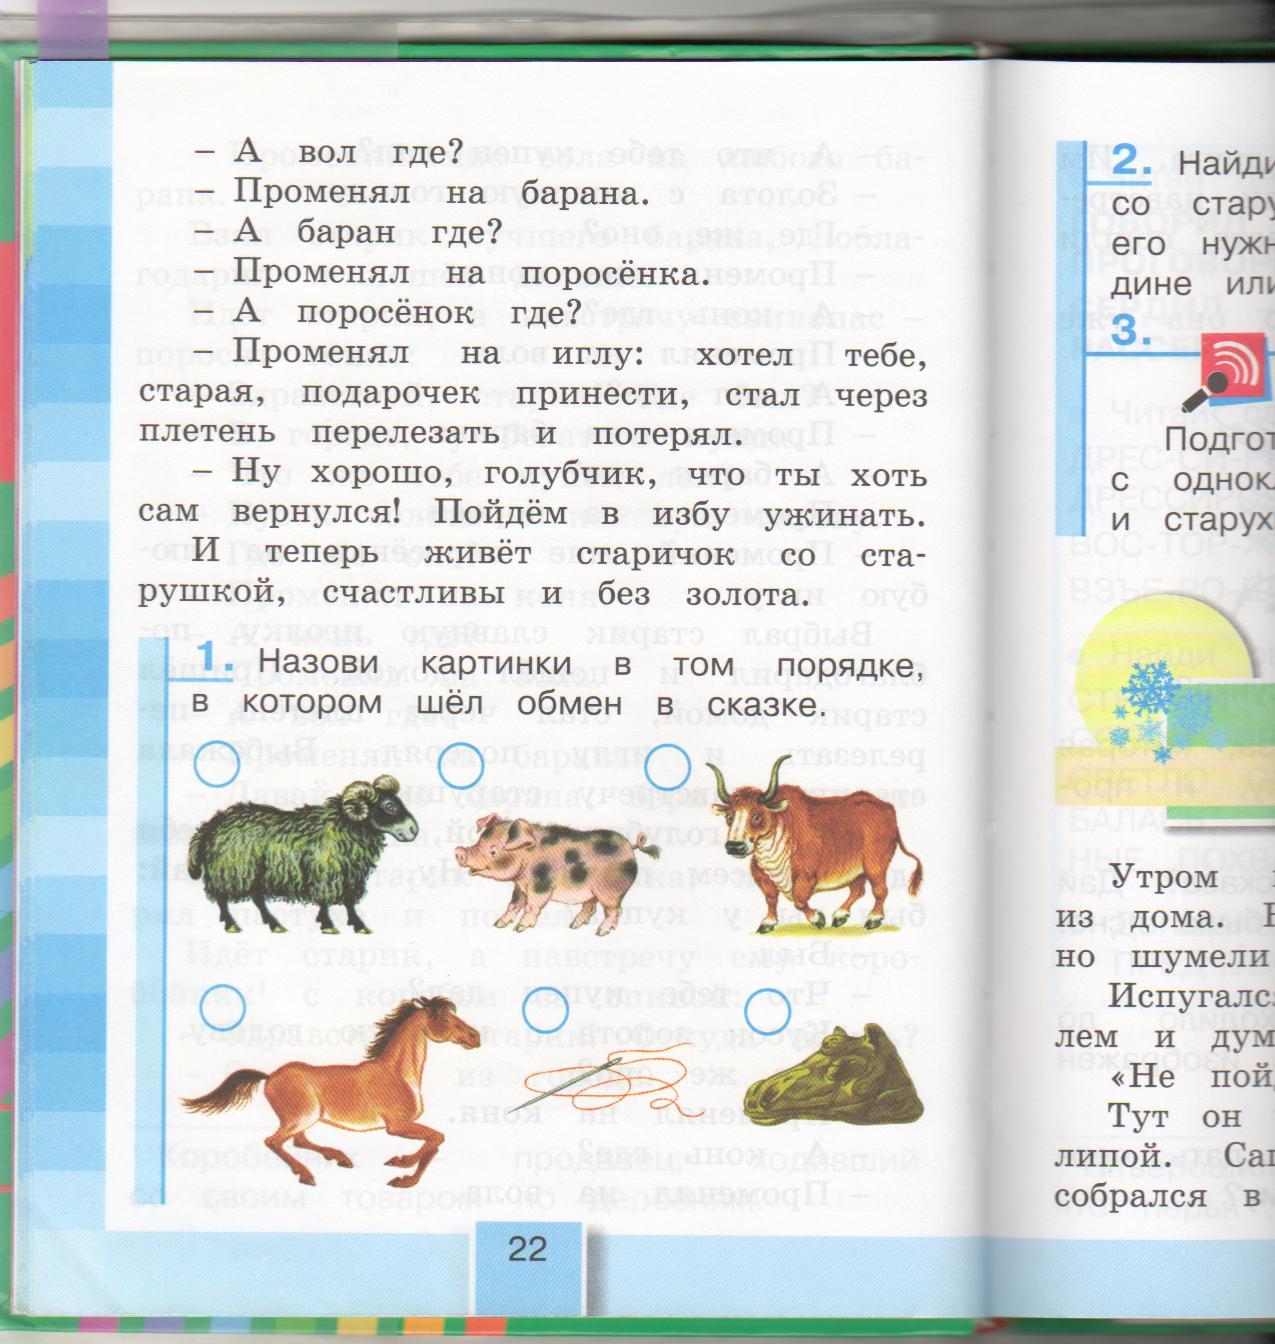 C:\Documents and Settings\UserXP\Рабочий стол\сказка 001.jpg